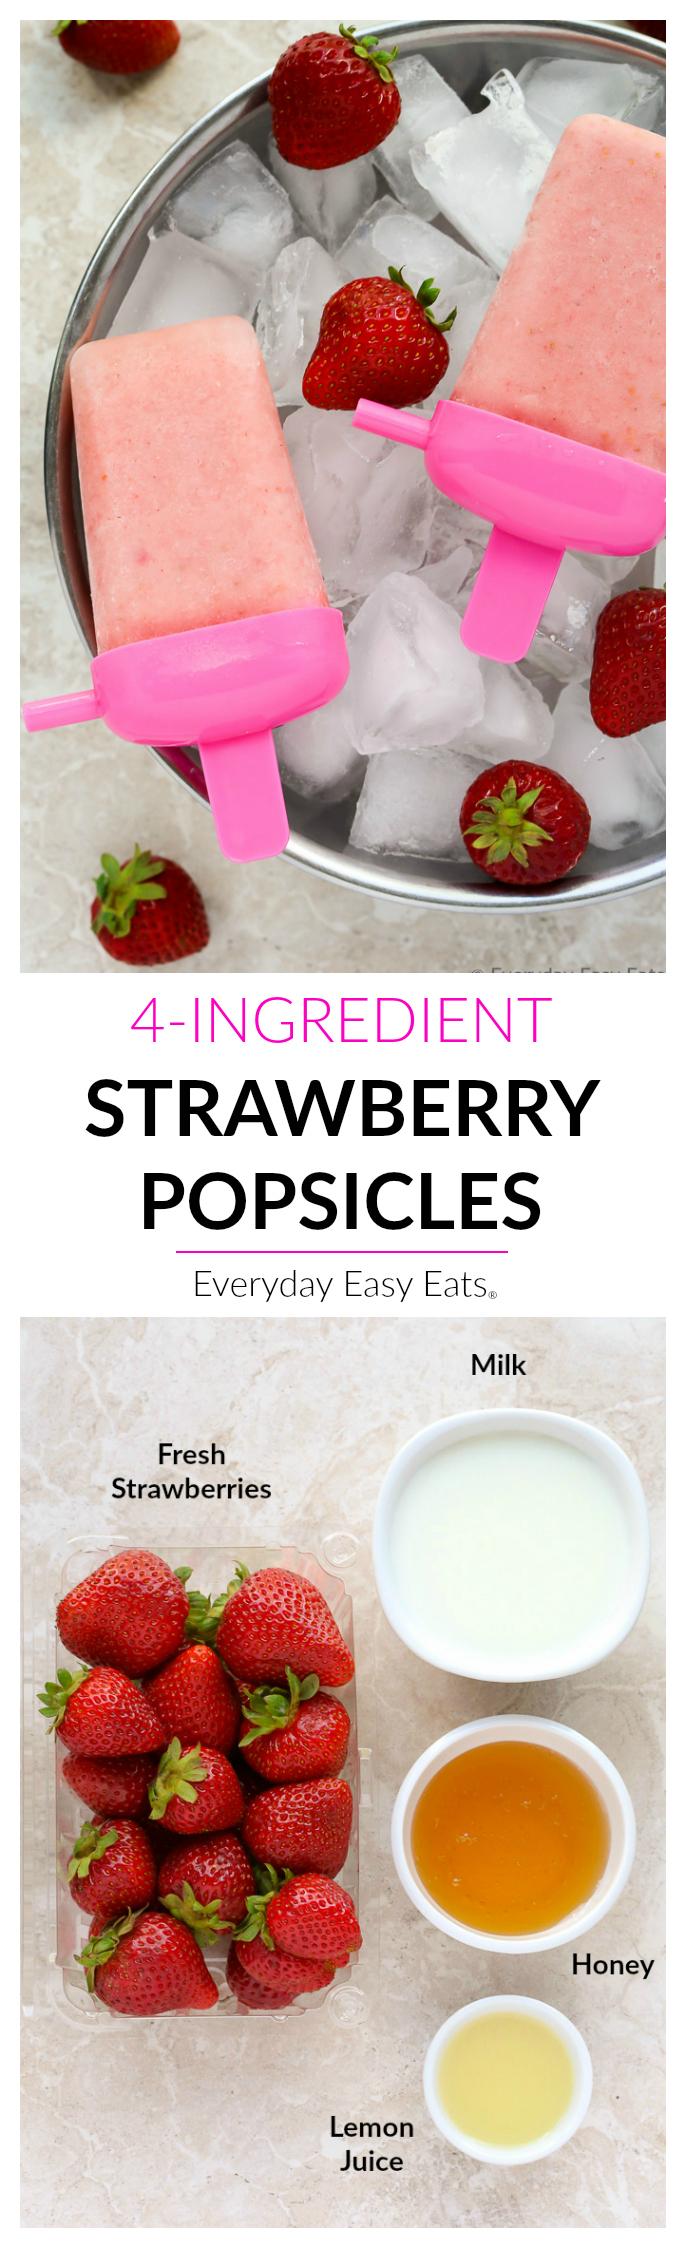 Healthy, 4-ingredient Strawberry Popsicles!   EverydayEasyEats.com